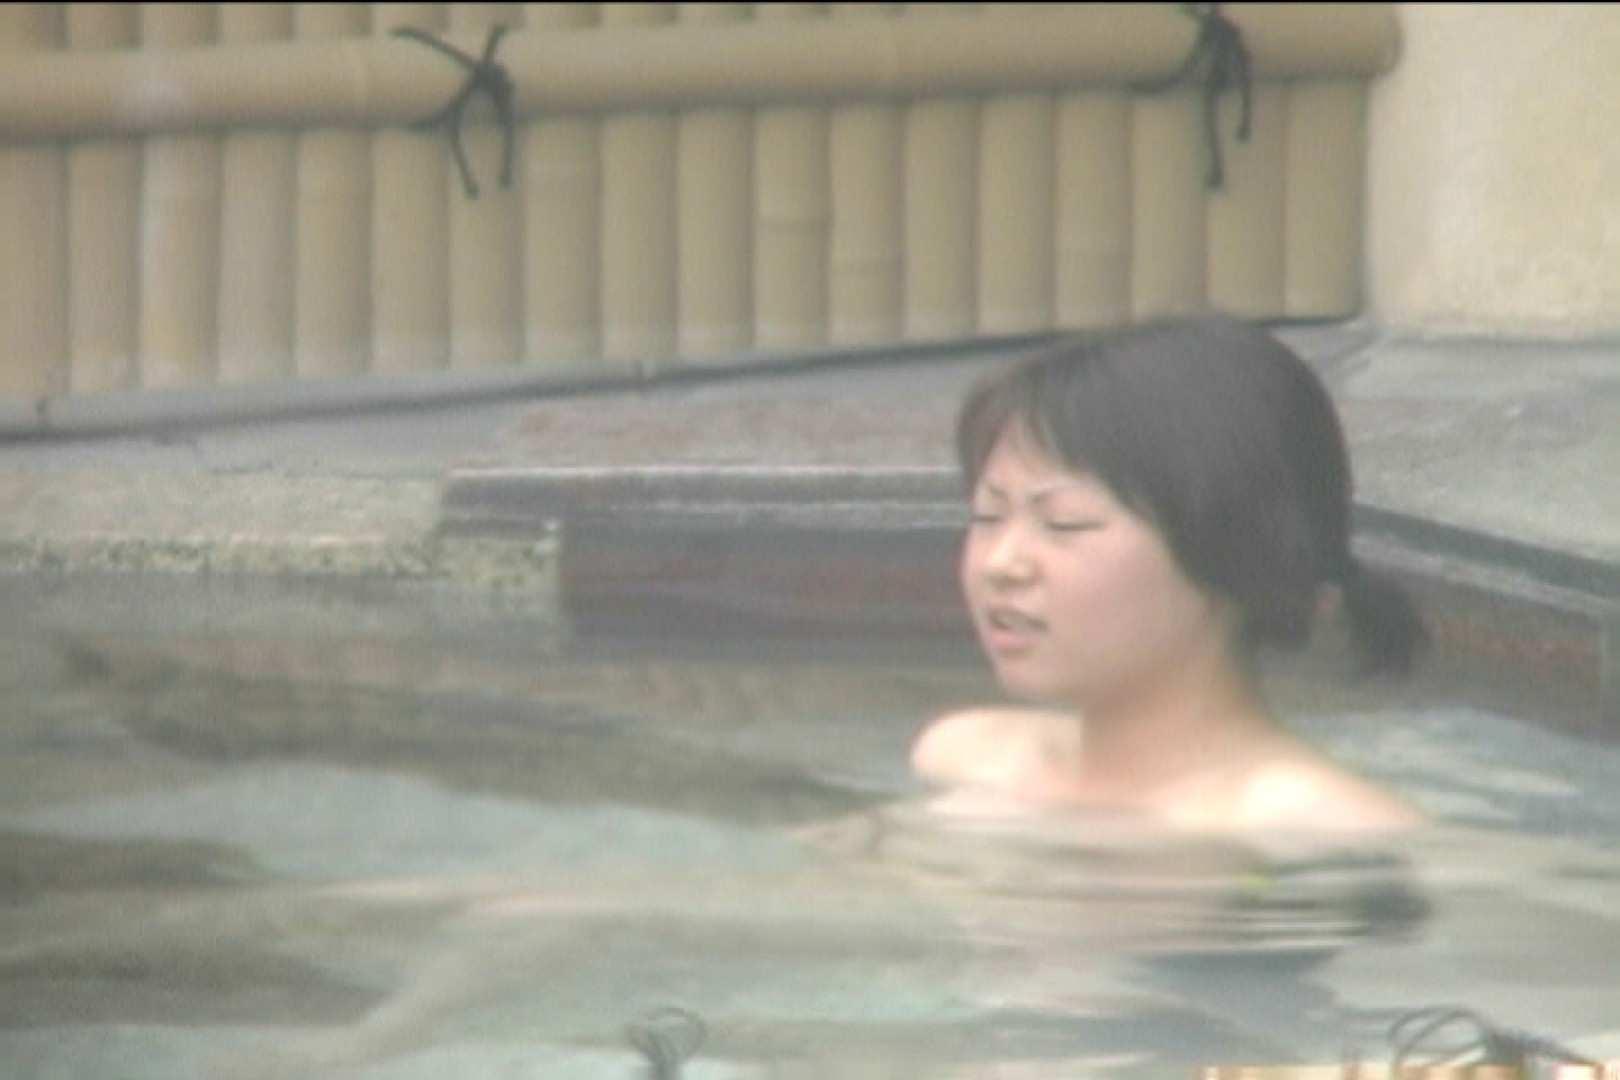 Aquaな露天風呂Vol.141 盗撮シリーズ   露天風呂編  96PIX 51